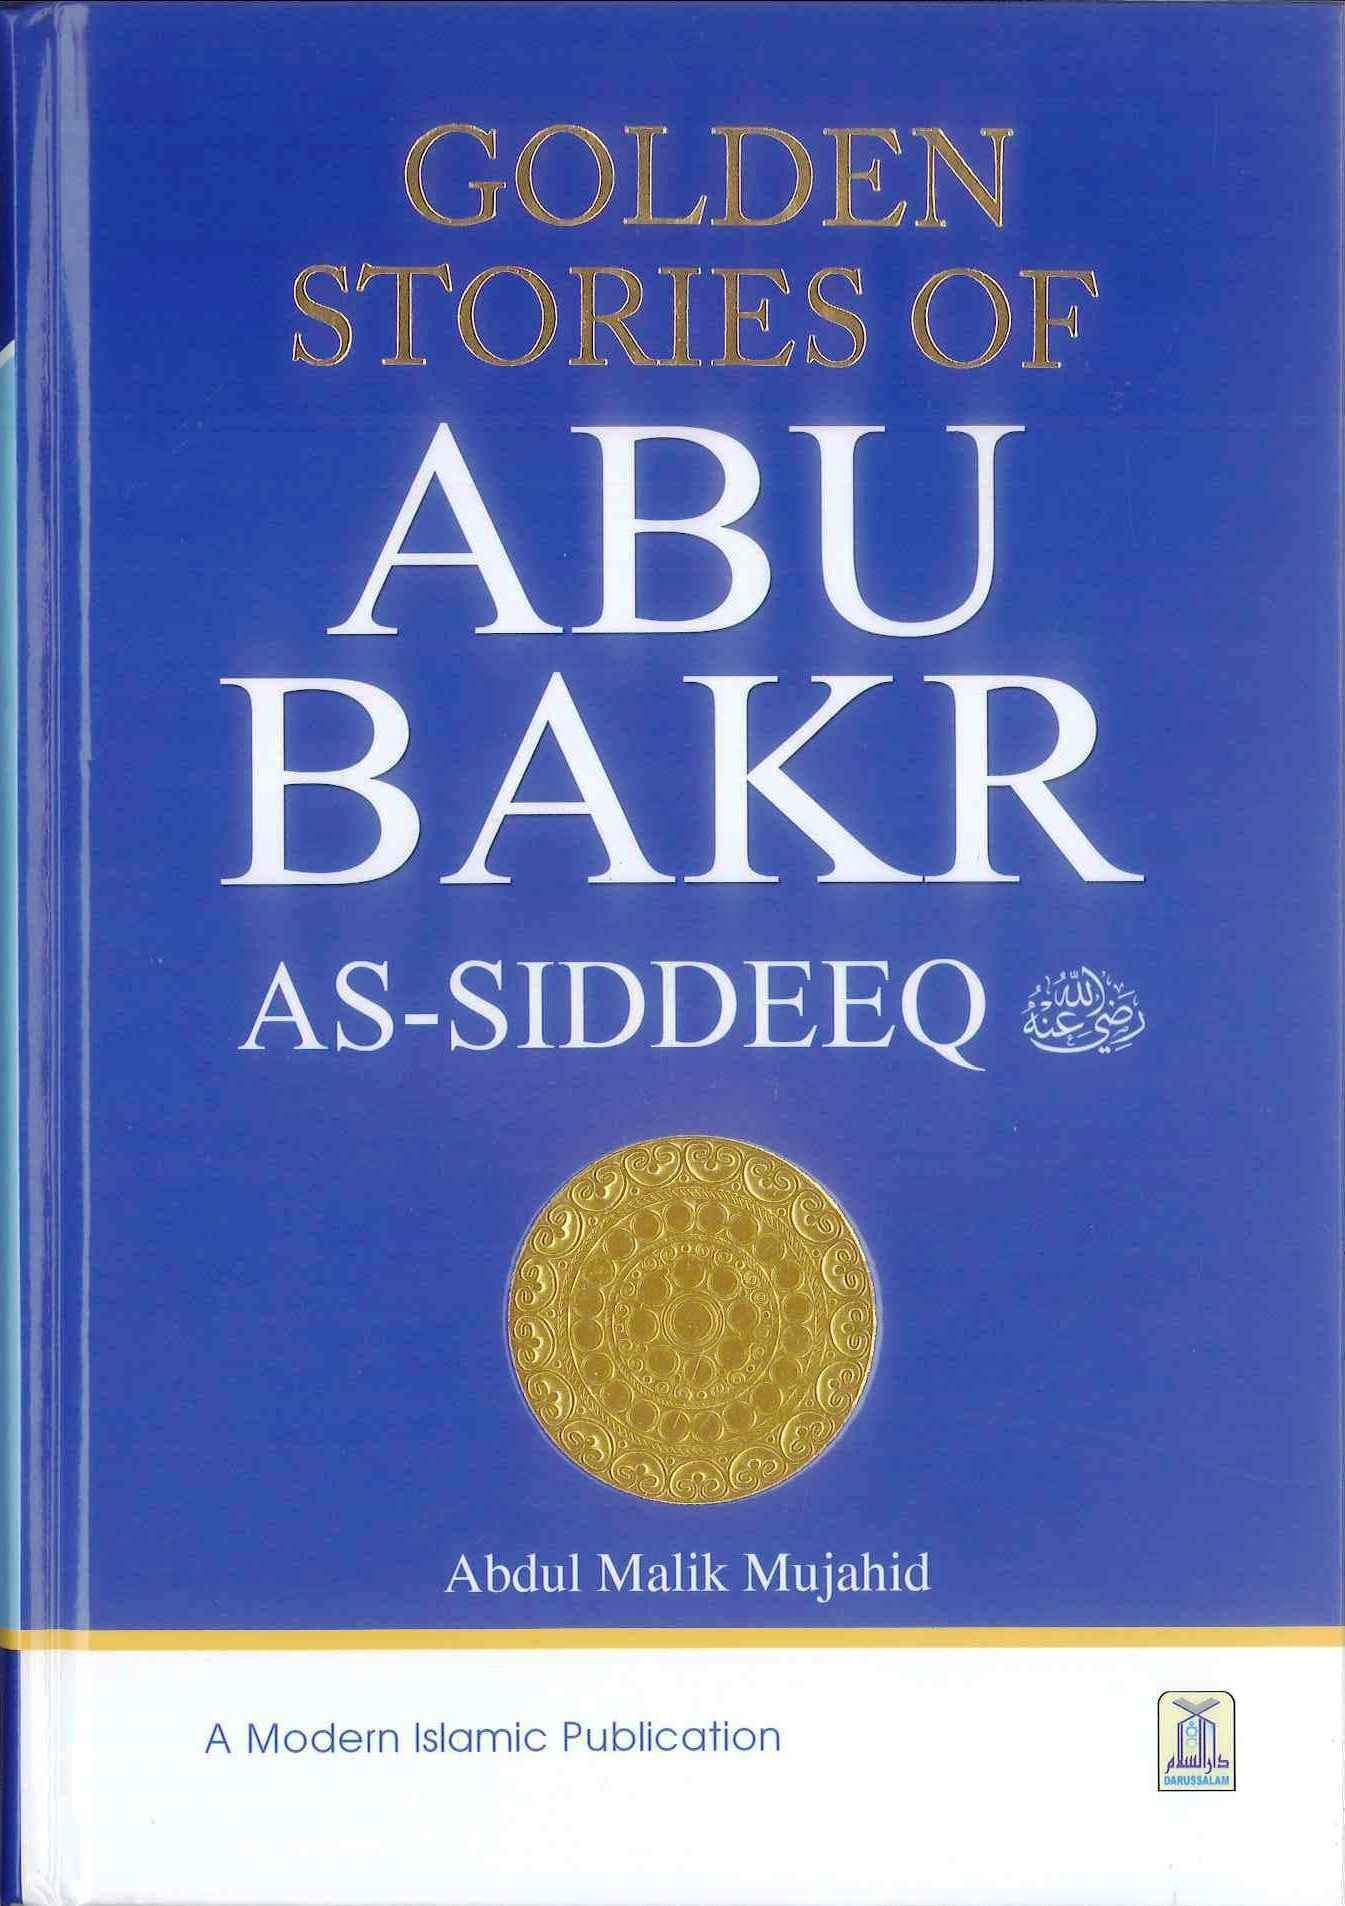 Golden Stories of Abu Bakr AsSiddeeq by Abdul Malik Mujahid